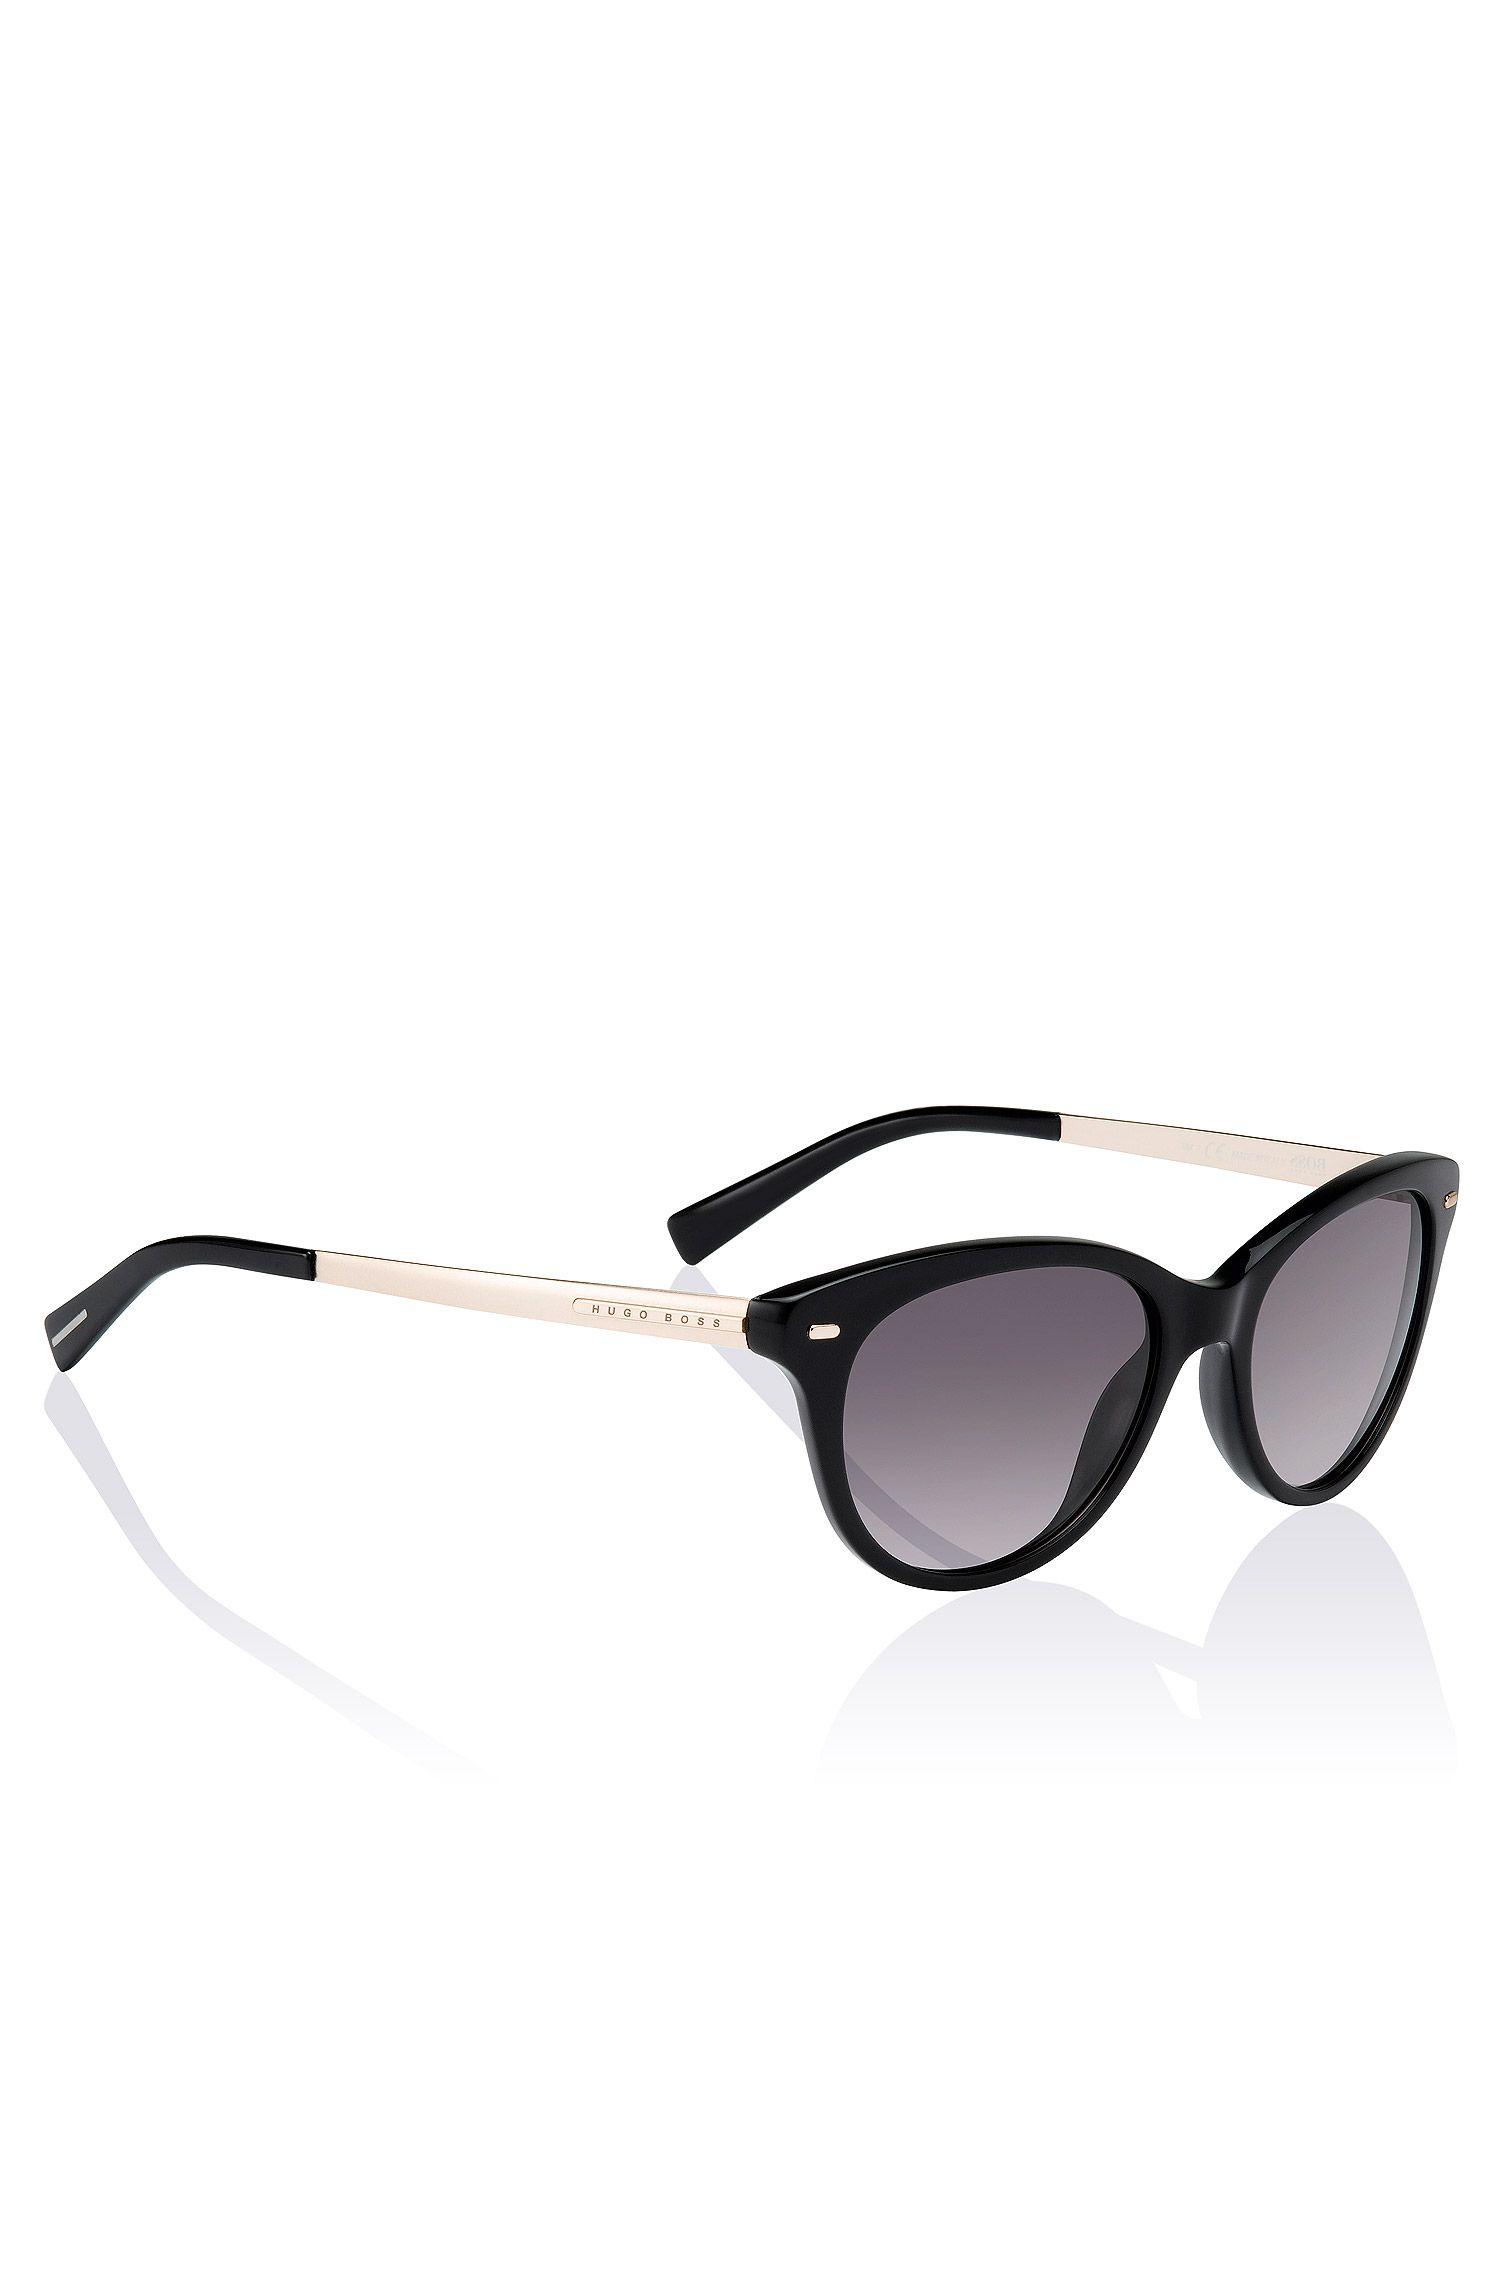 Sunglasses 'BOSS 0576/S'